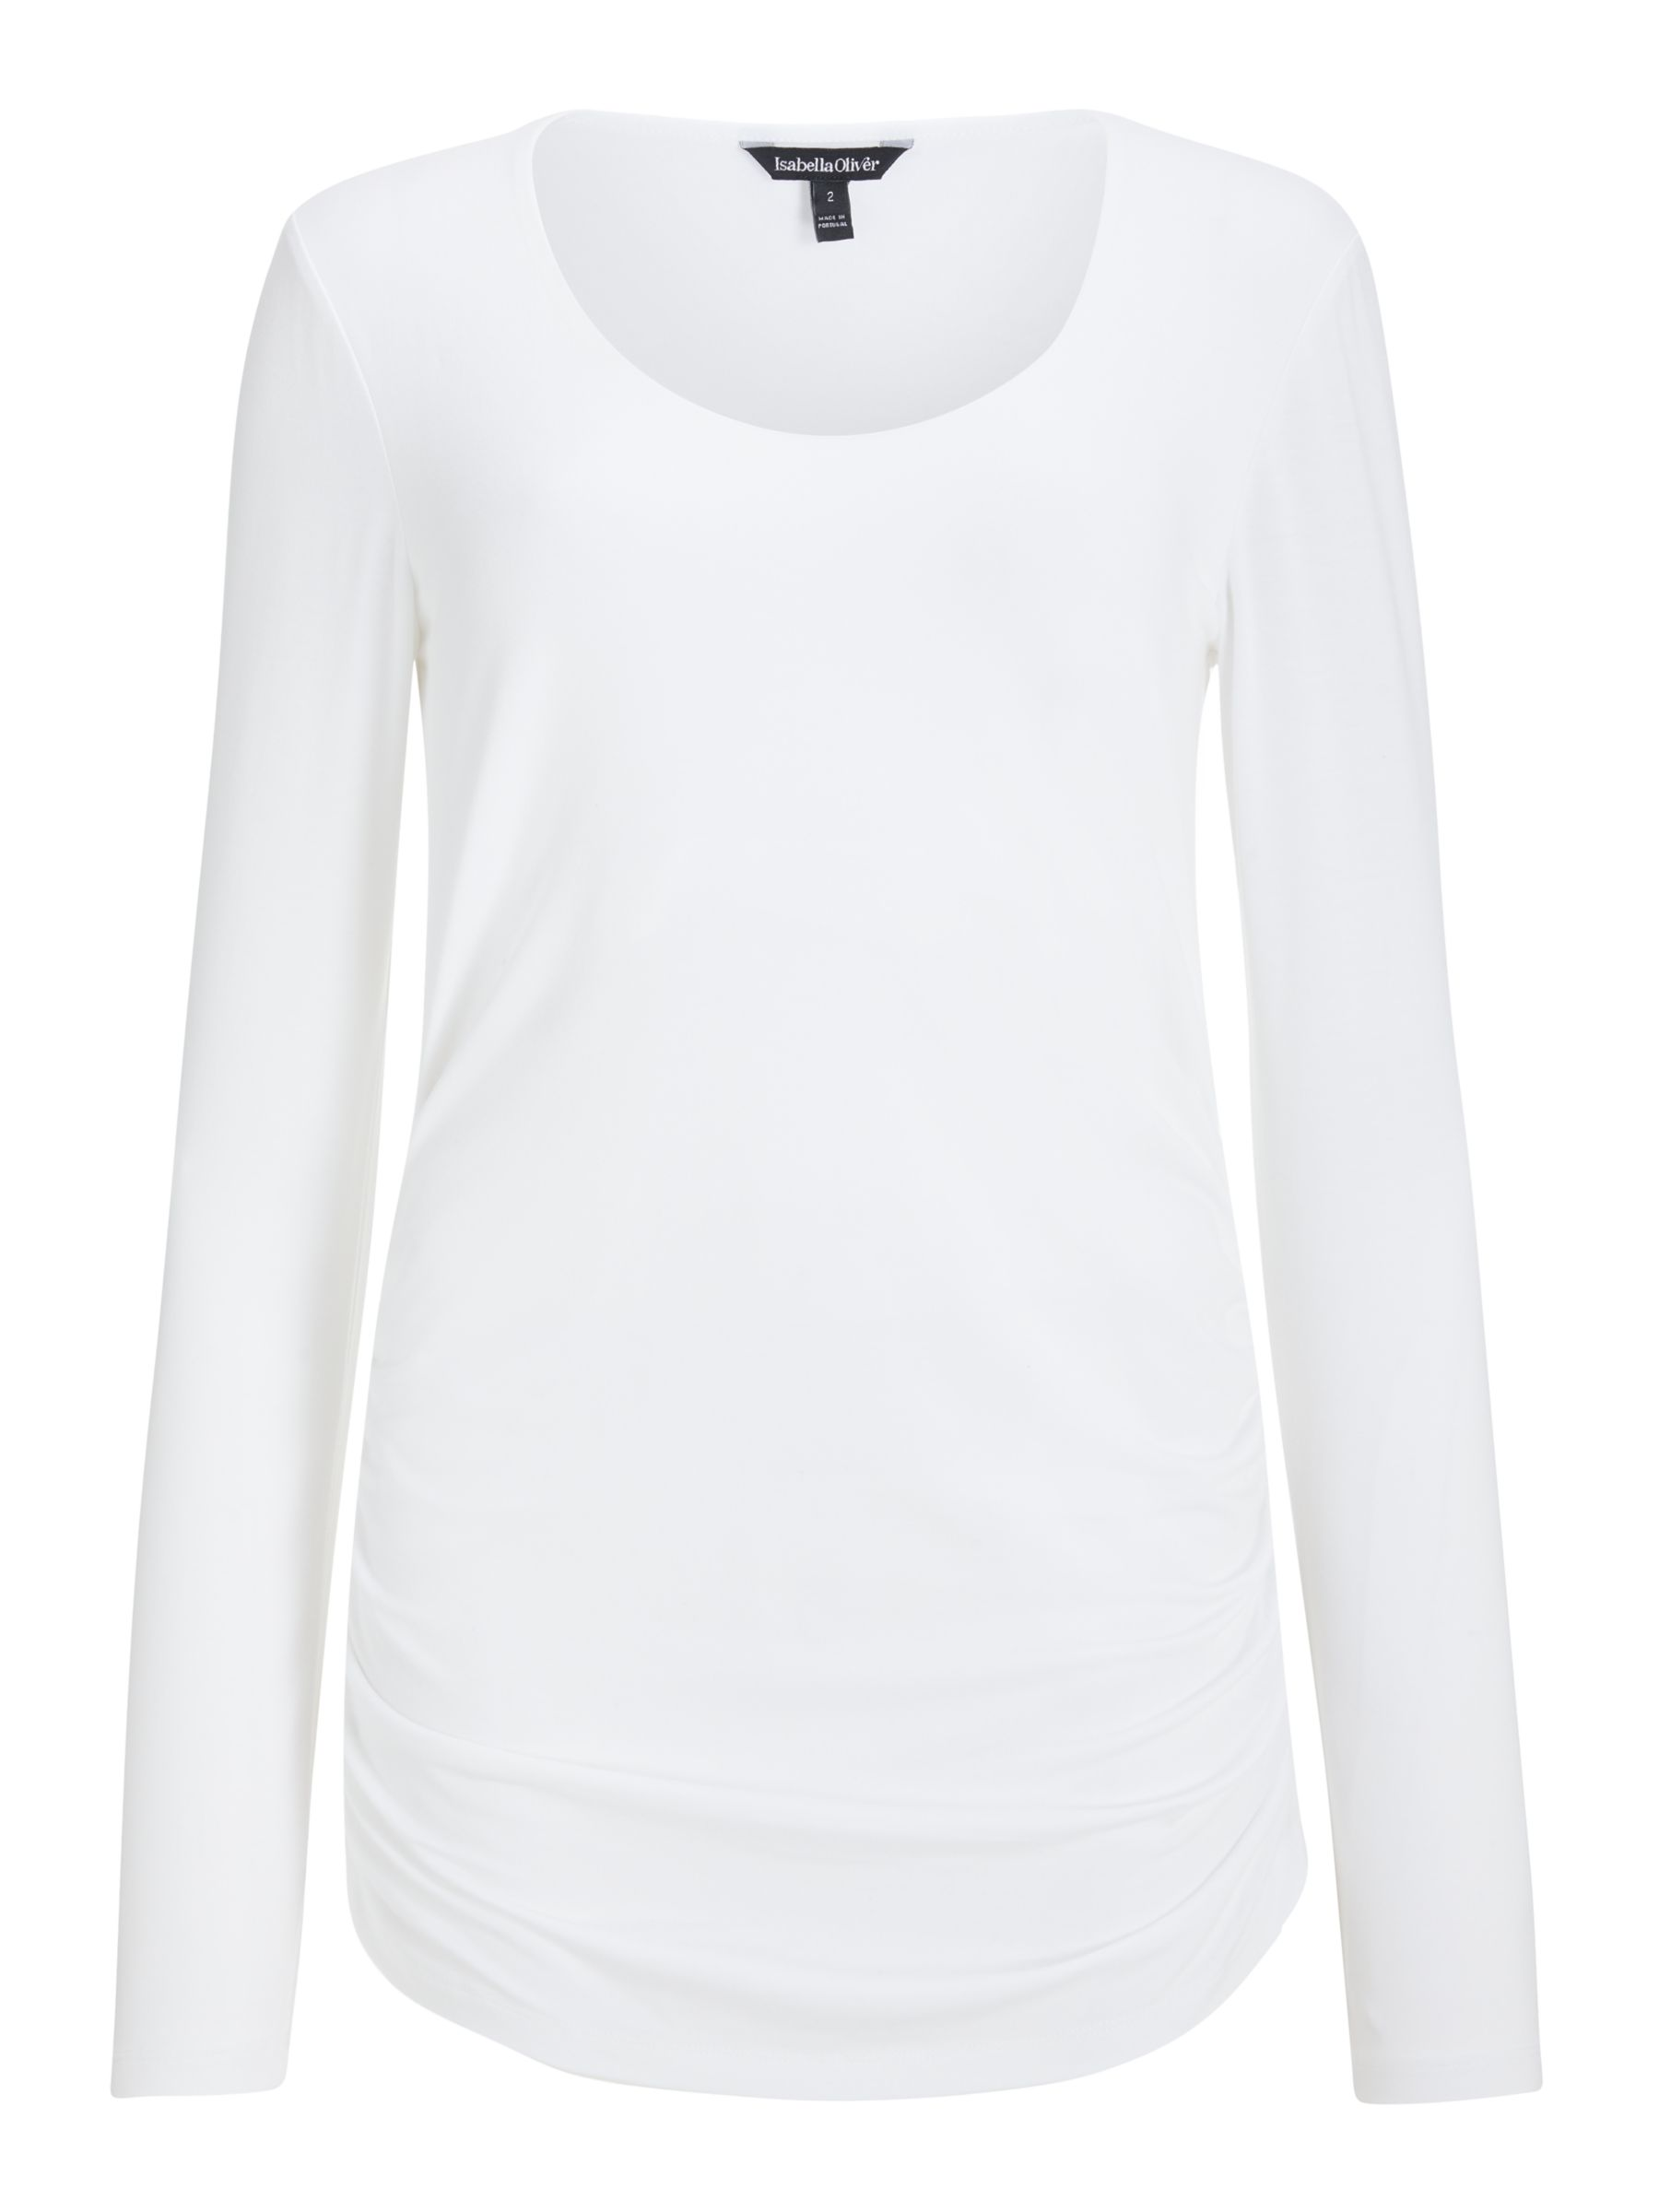 Isabella Oliver Isabella Oliver Long Sleeve Scoop Neck Maternity Top, White